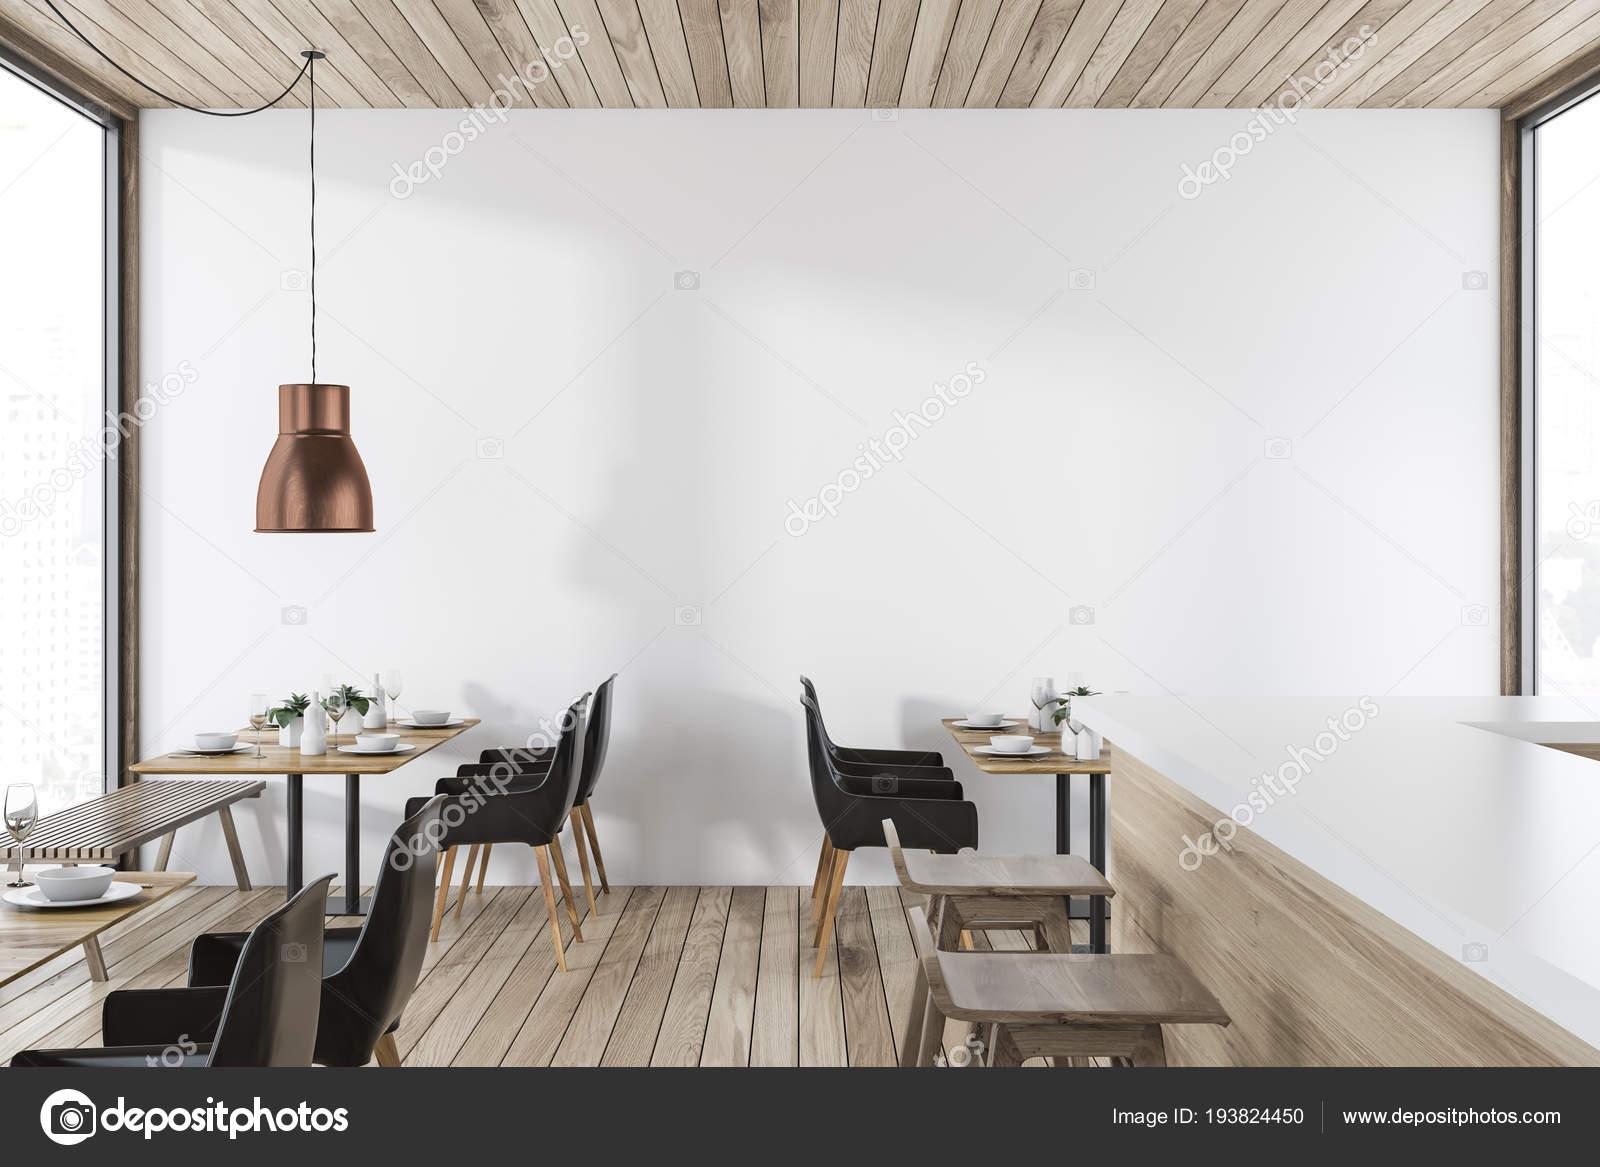 Swell Luxury Loft Restaurant Interior Wooden Floor White Walls Set Ibusinesslaw Wood Chair Design Ideas Ibusinesslaworg